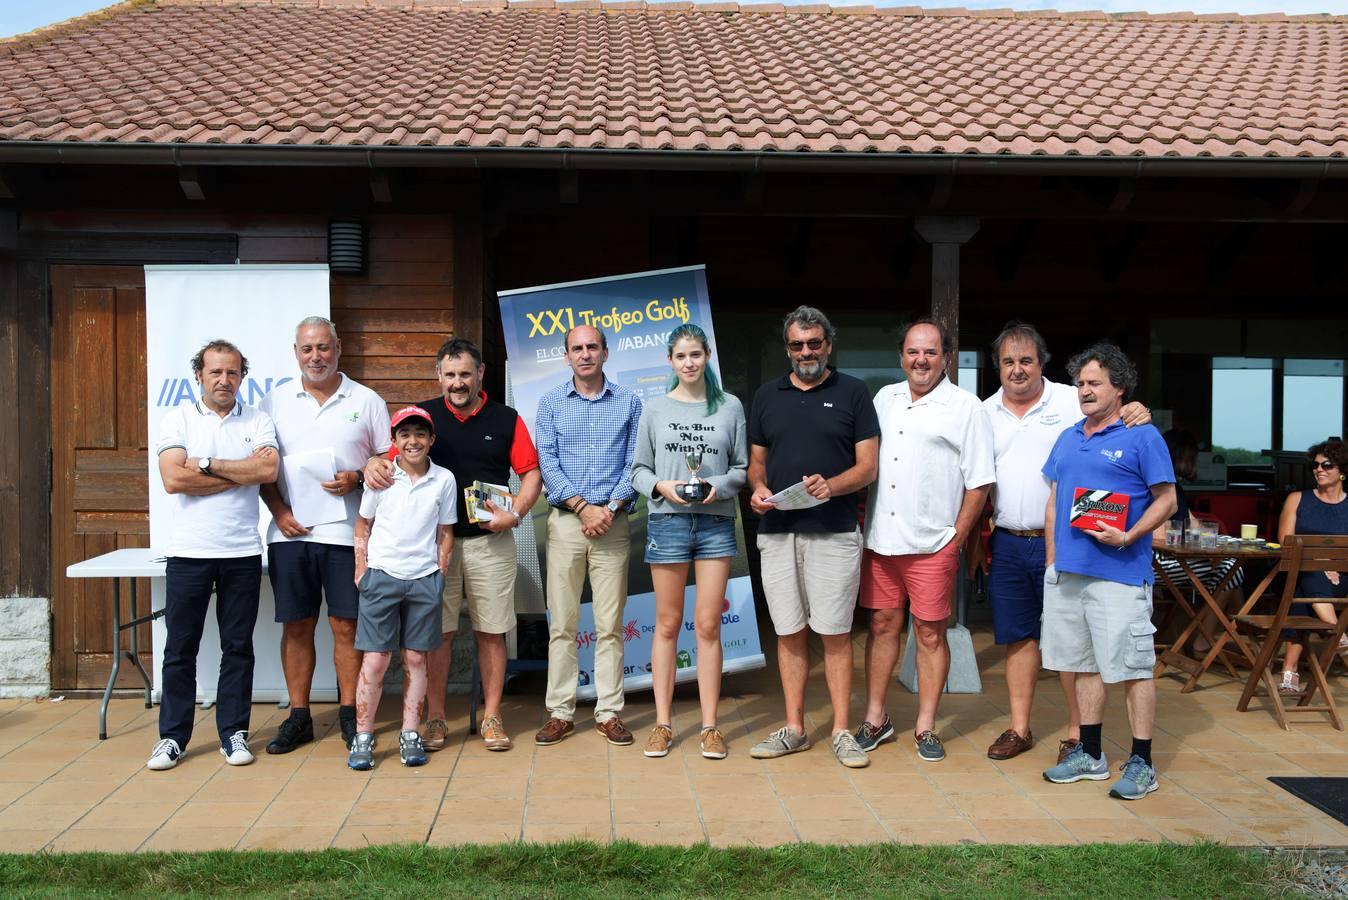 Trofeo de Golf El Comercio //Abanca: La Rasa de Berbés (Ribadesella)